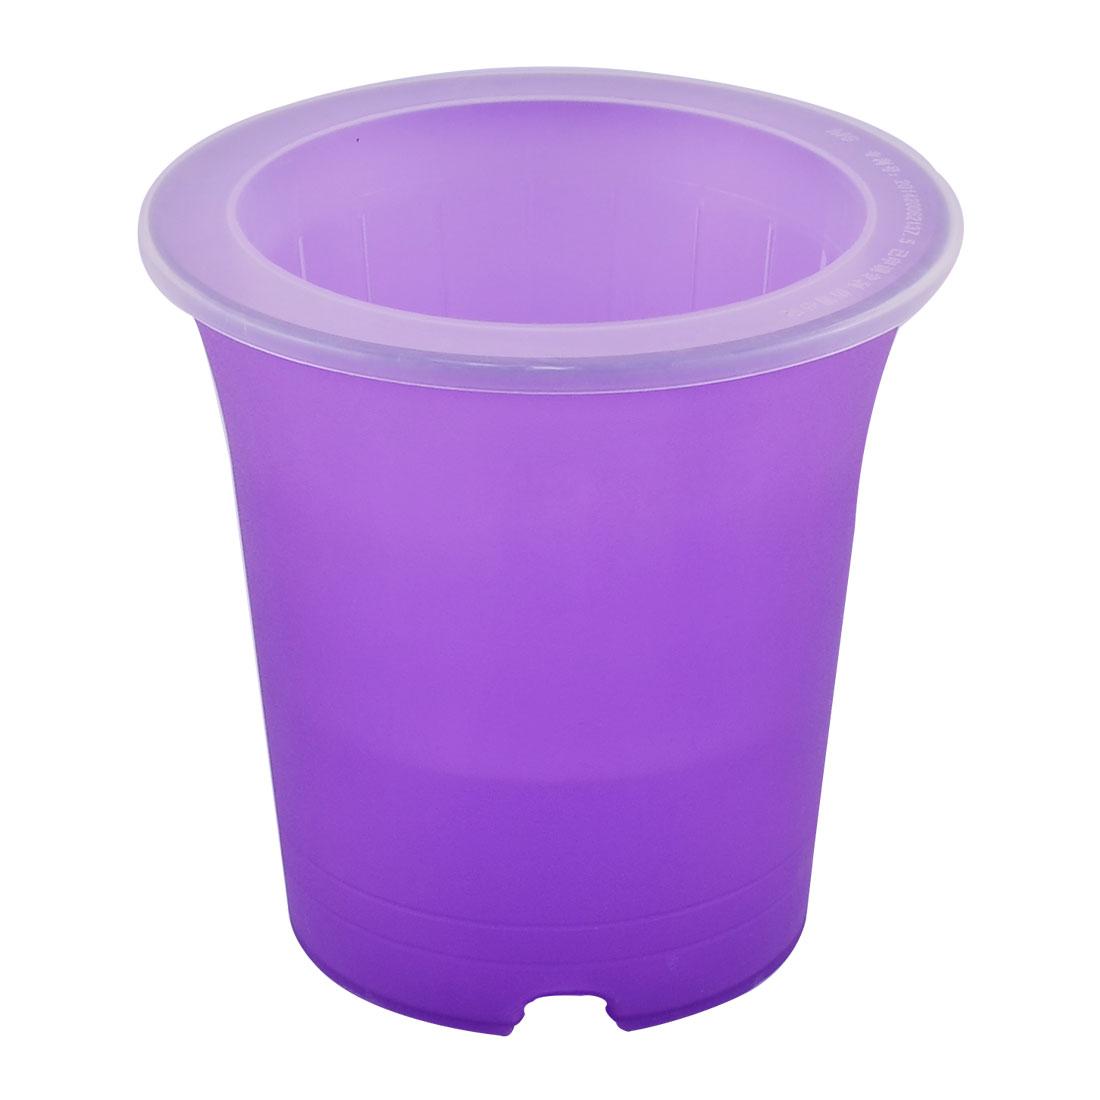 Desktop Decor Plastic Round Design Self Watering Planter Flower Pot Purple